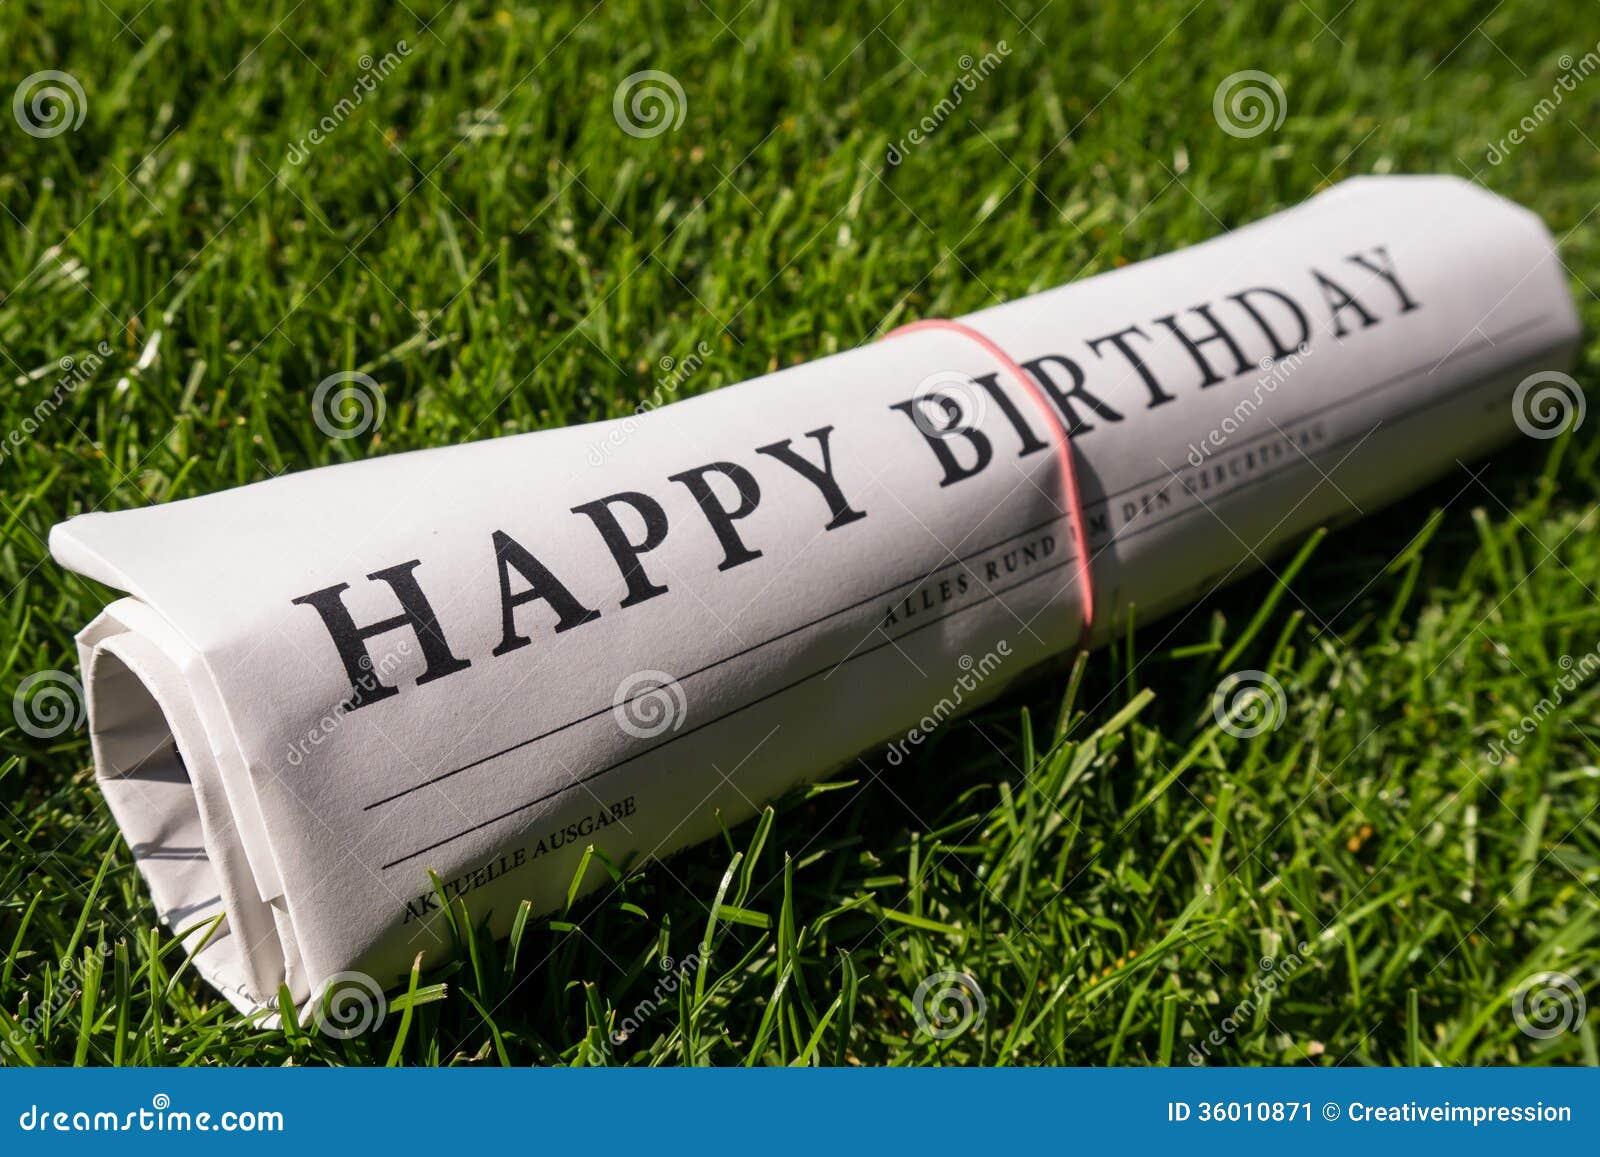 Happy birthday newspaper stock image image of media 36010871 happy birthday newspaper bookmarktalkfo Choice Image